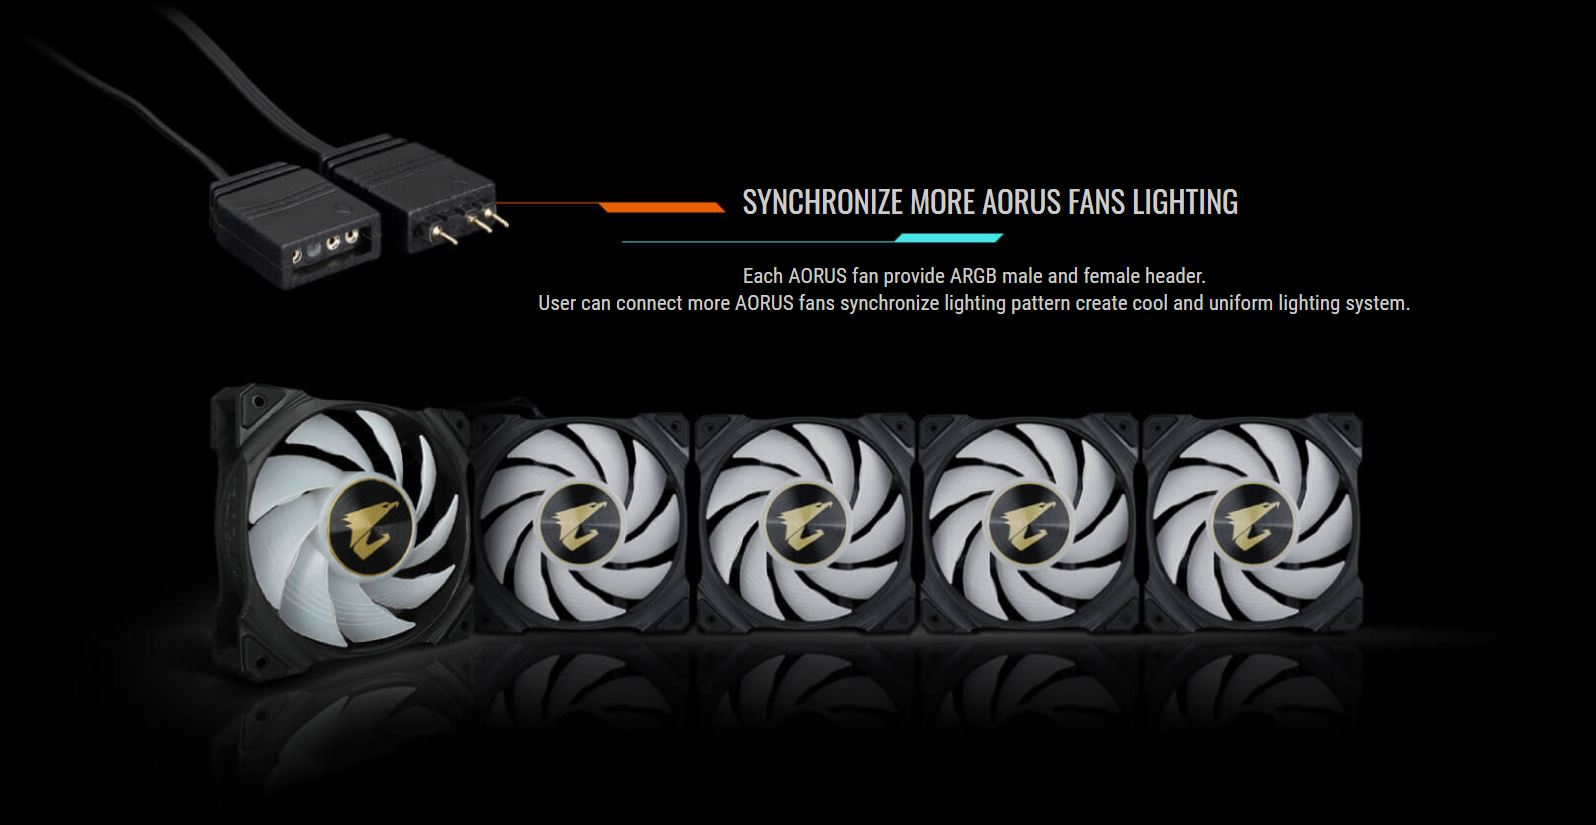 Tản nhiệt nước CPU AIO GIGABYTE AORUS WATER FORCE X 360 giới thiệu 14